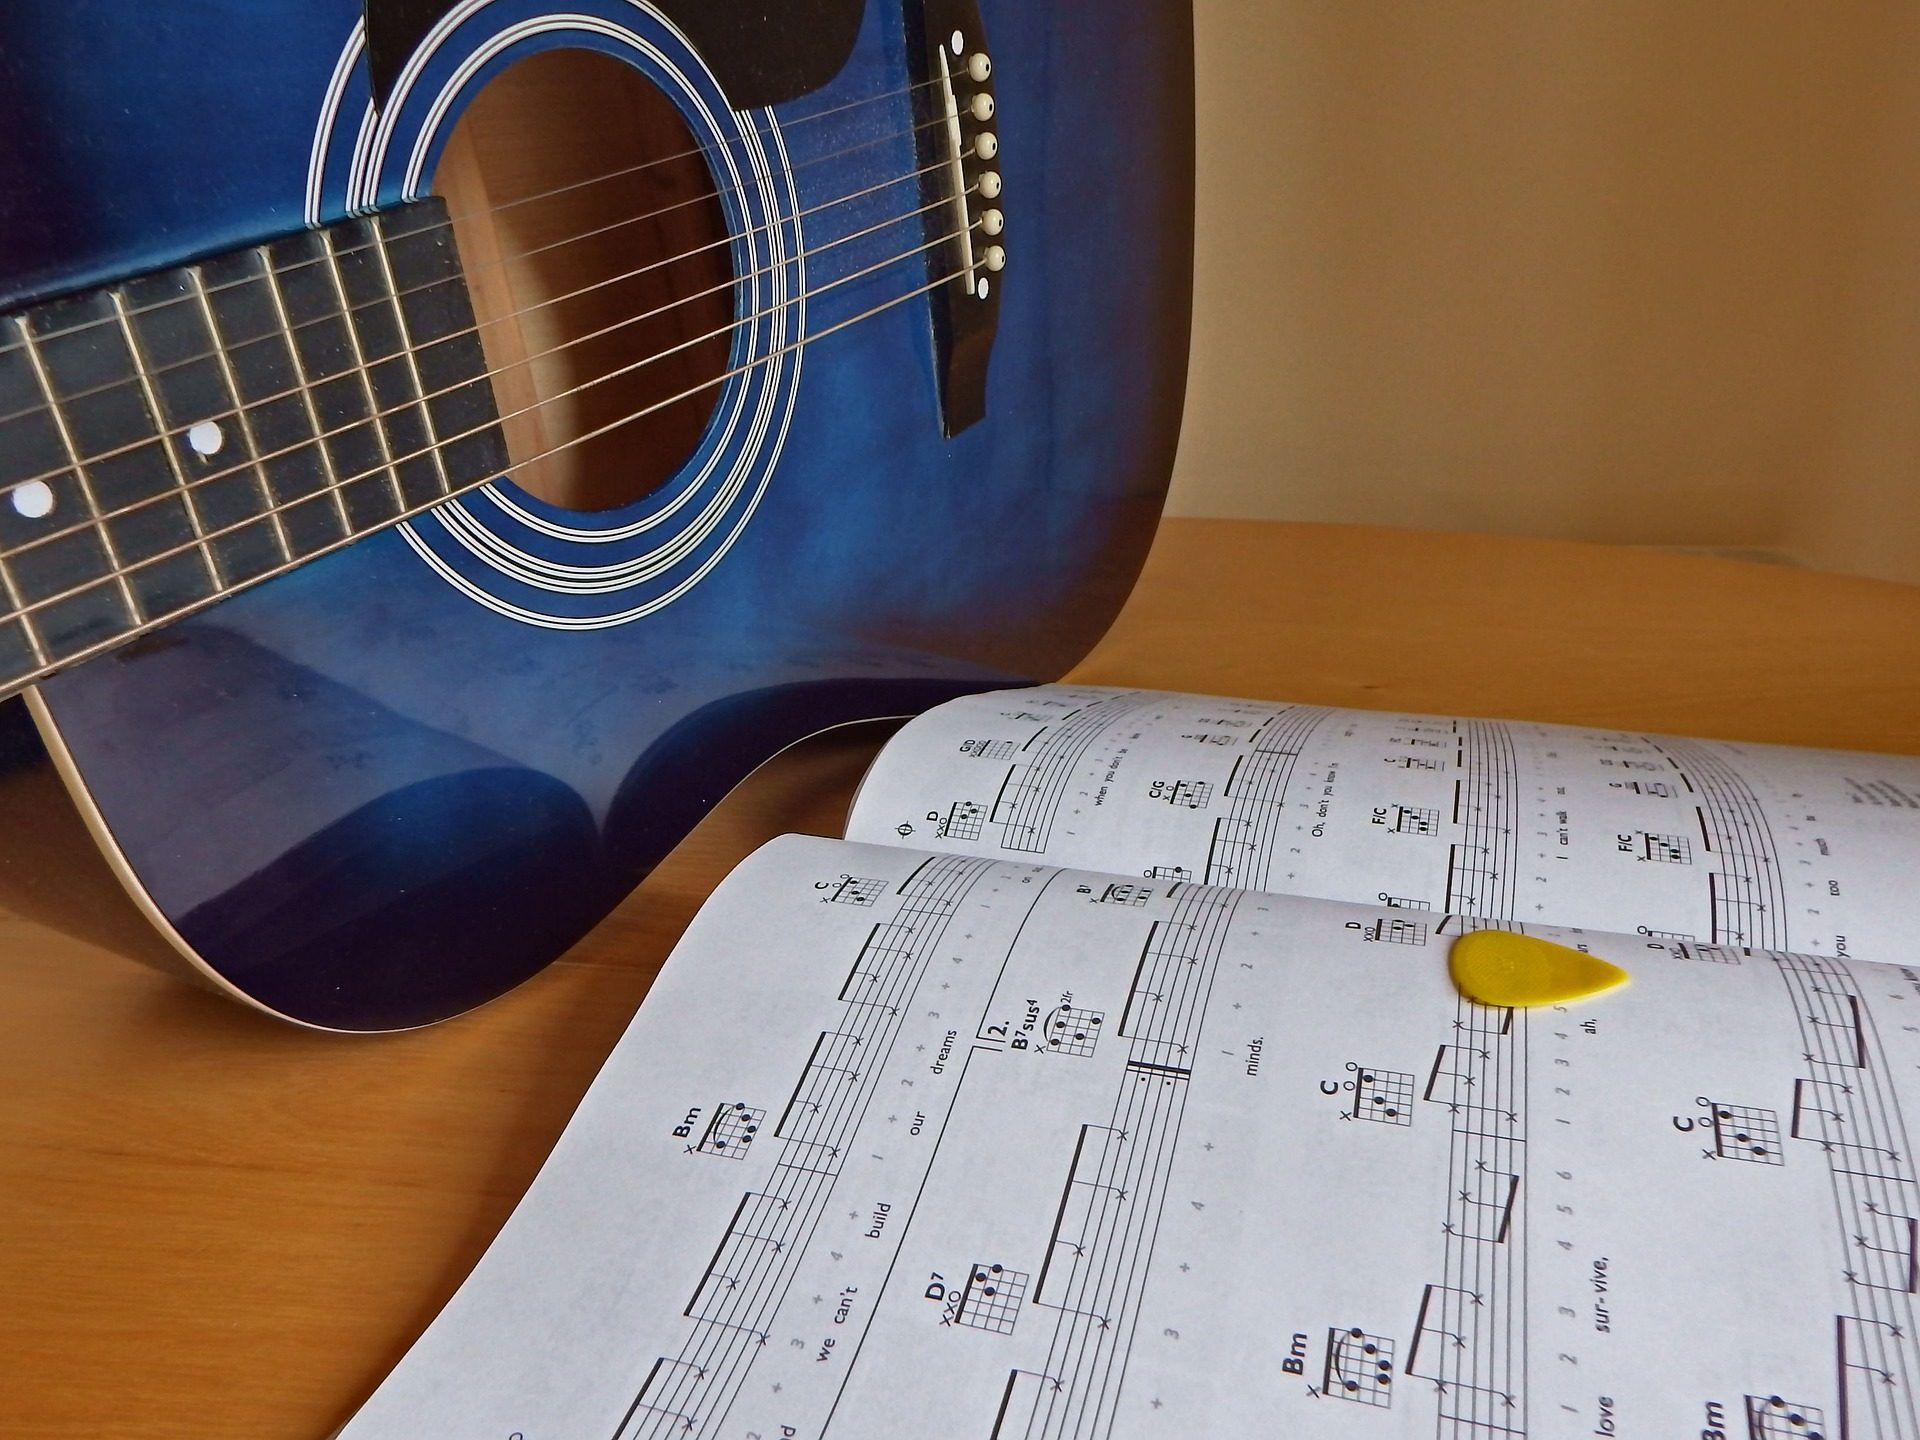 guitarra, partitura, notas, cuerdas, púa, 1708262052 | Fondos de ...